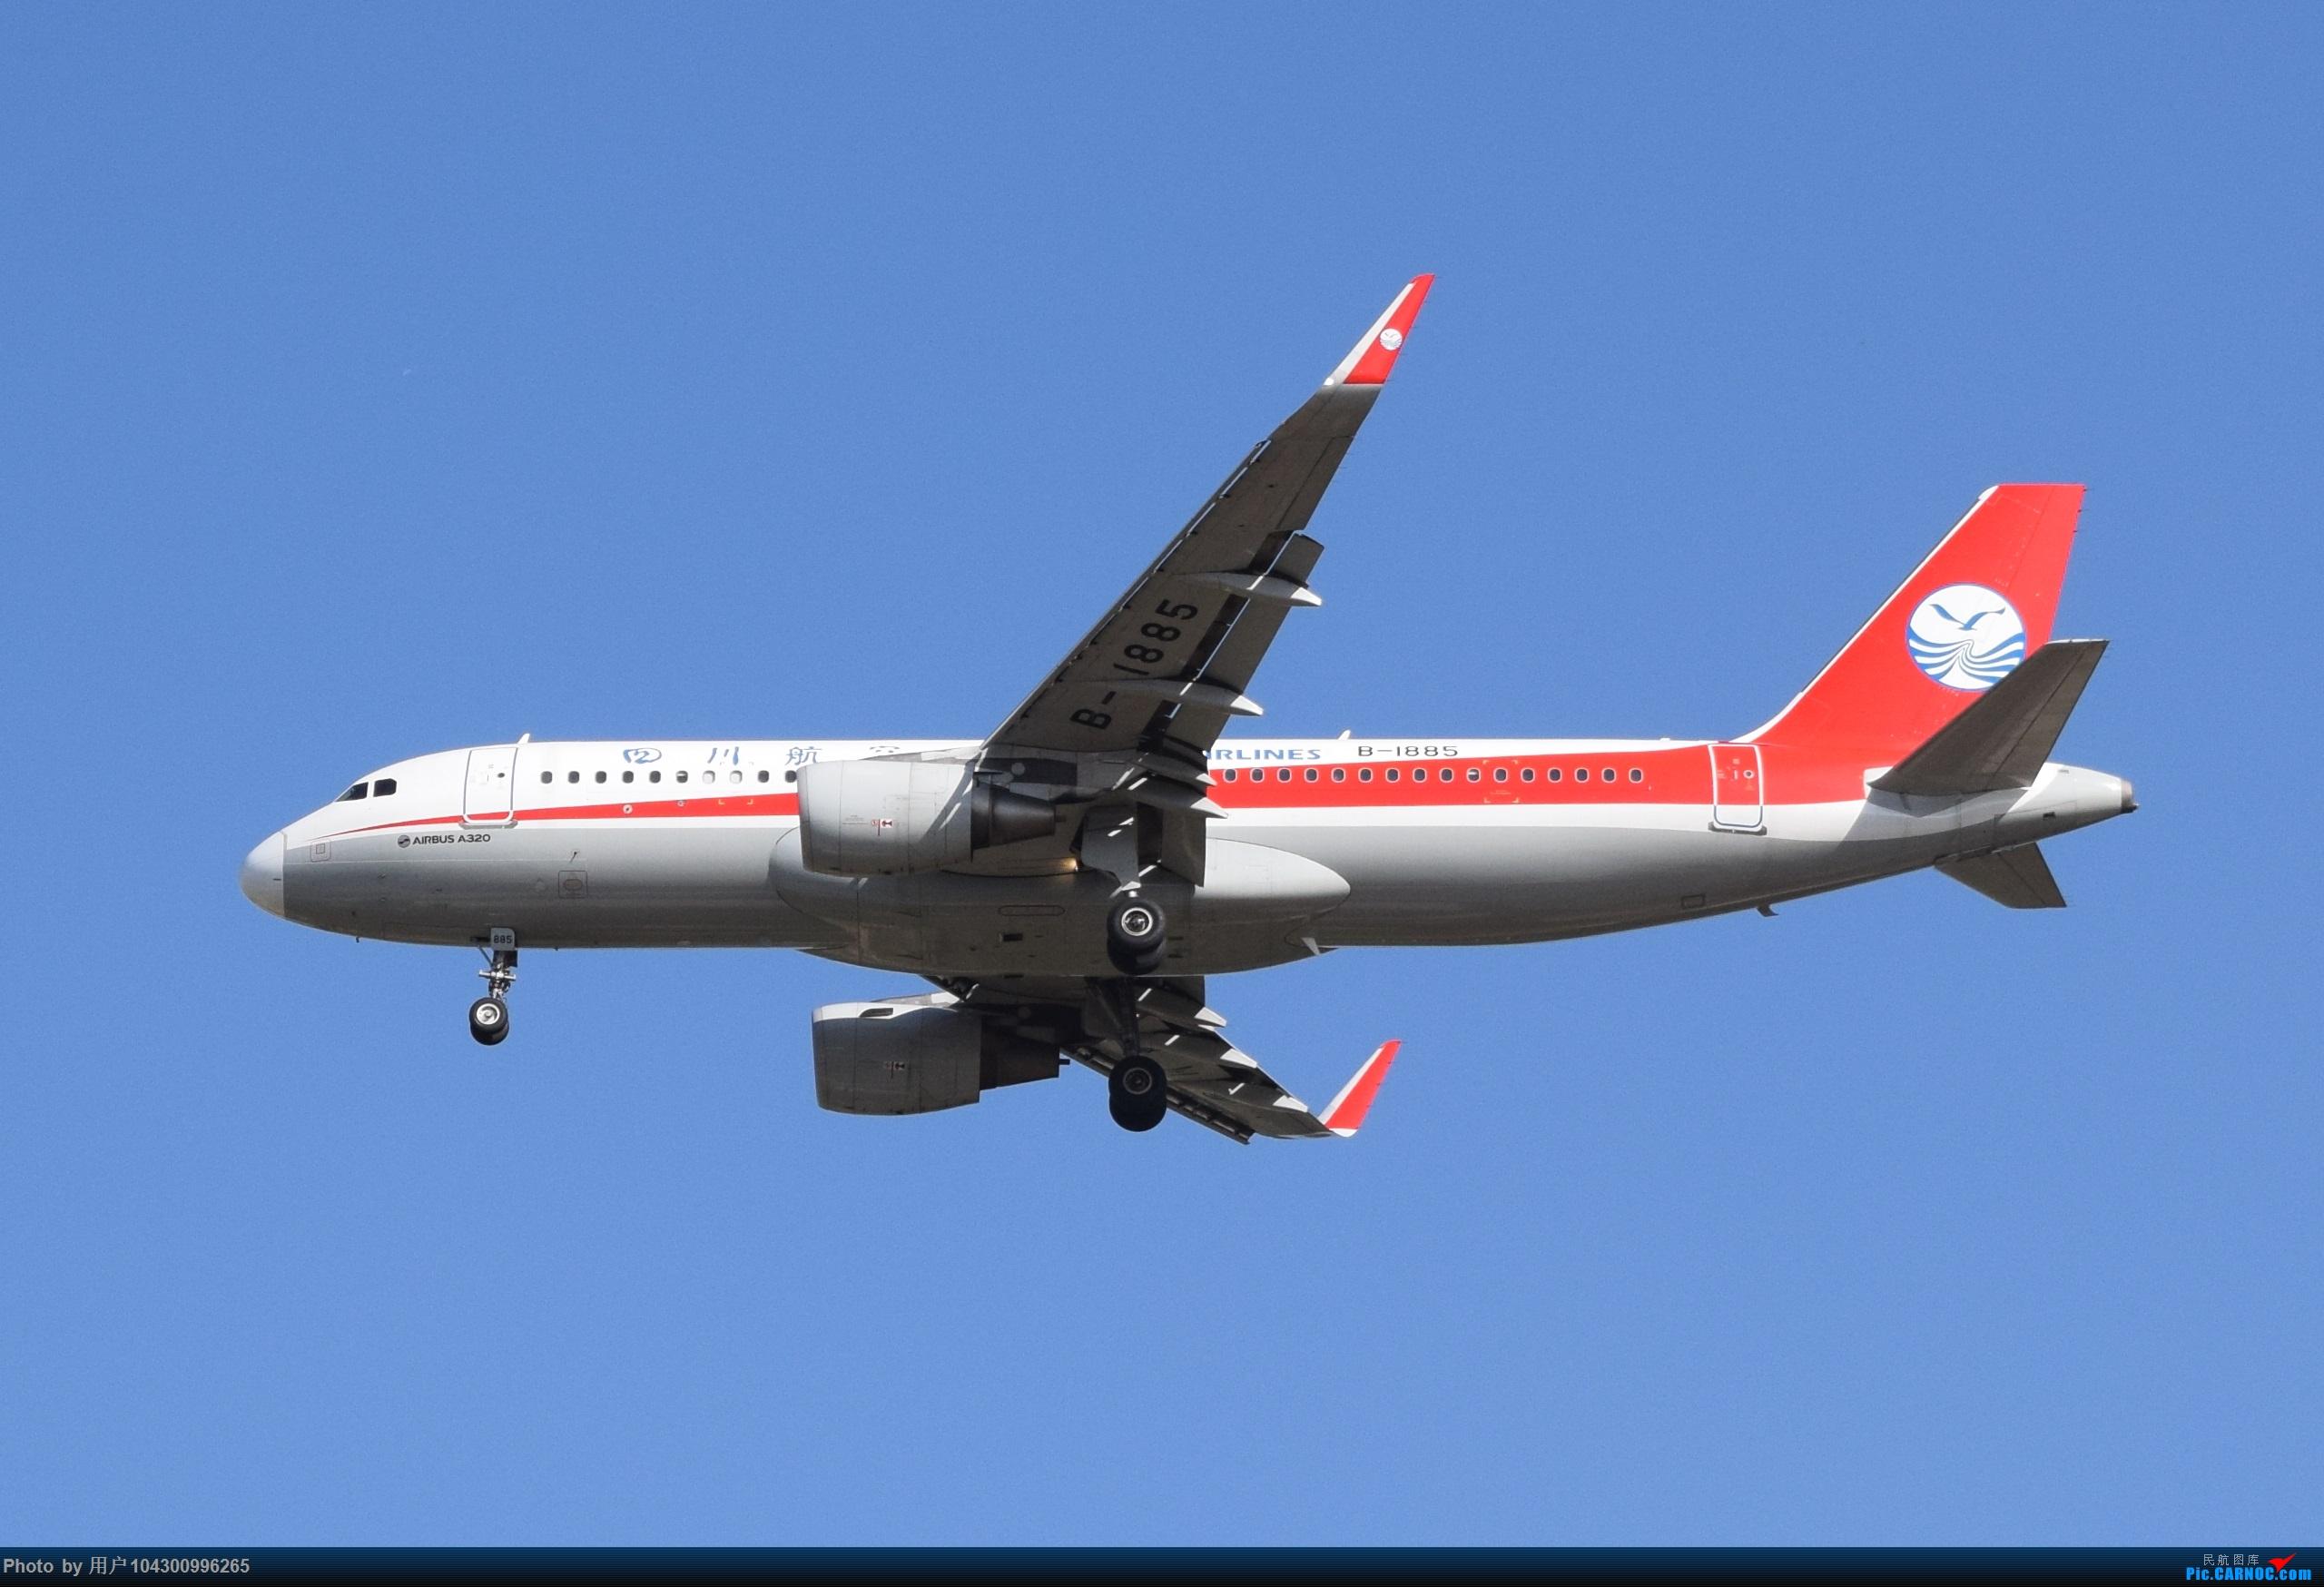 Re:[原创][KWE]贵阳今天天气不错,随便拍几张! AIRBUS A320-200 B-1885 中国贵阳龙洞堡国际机场